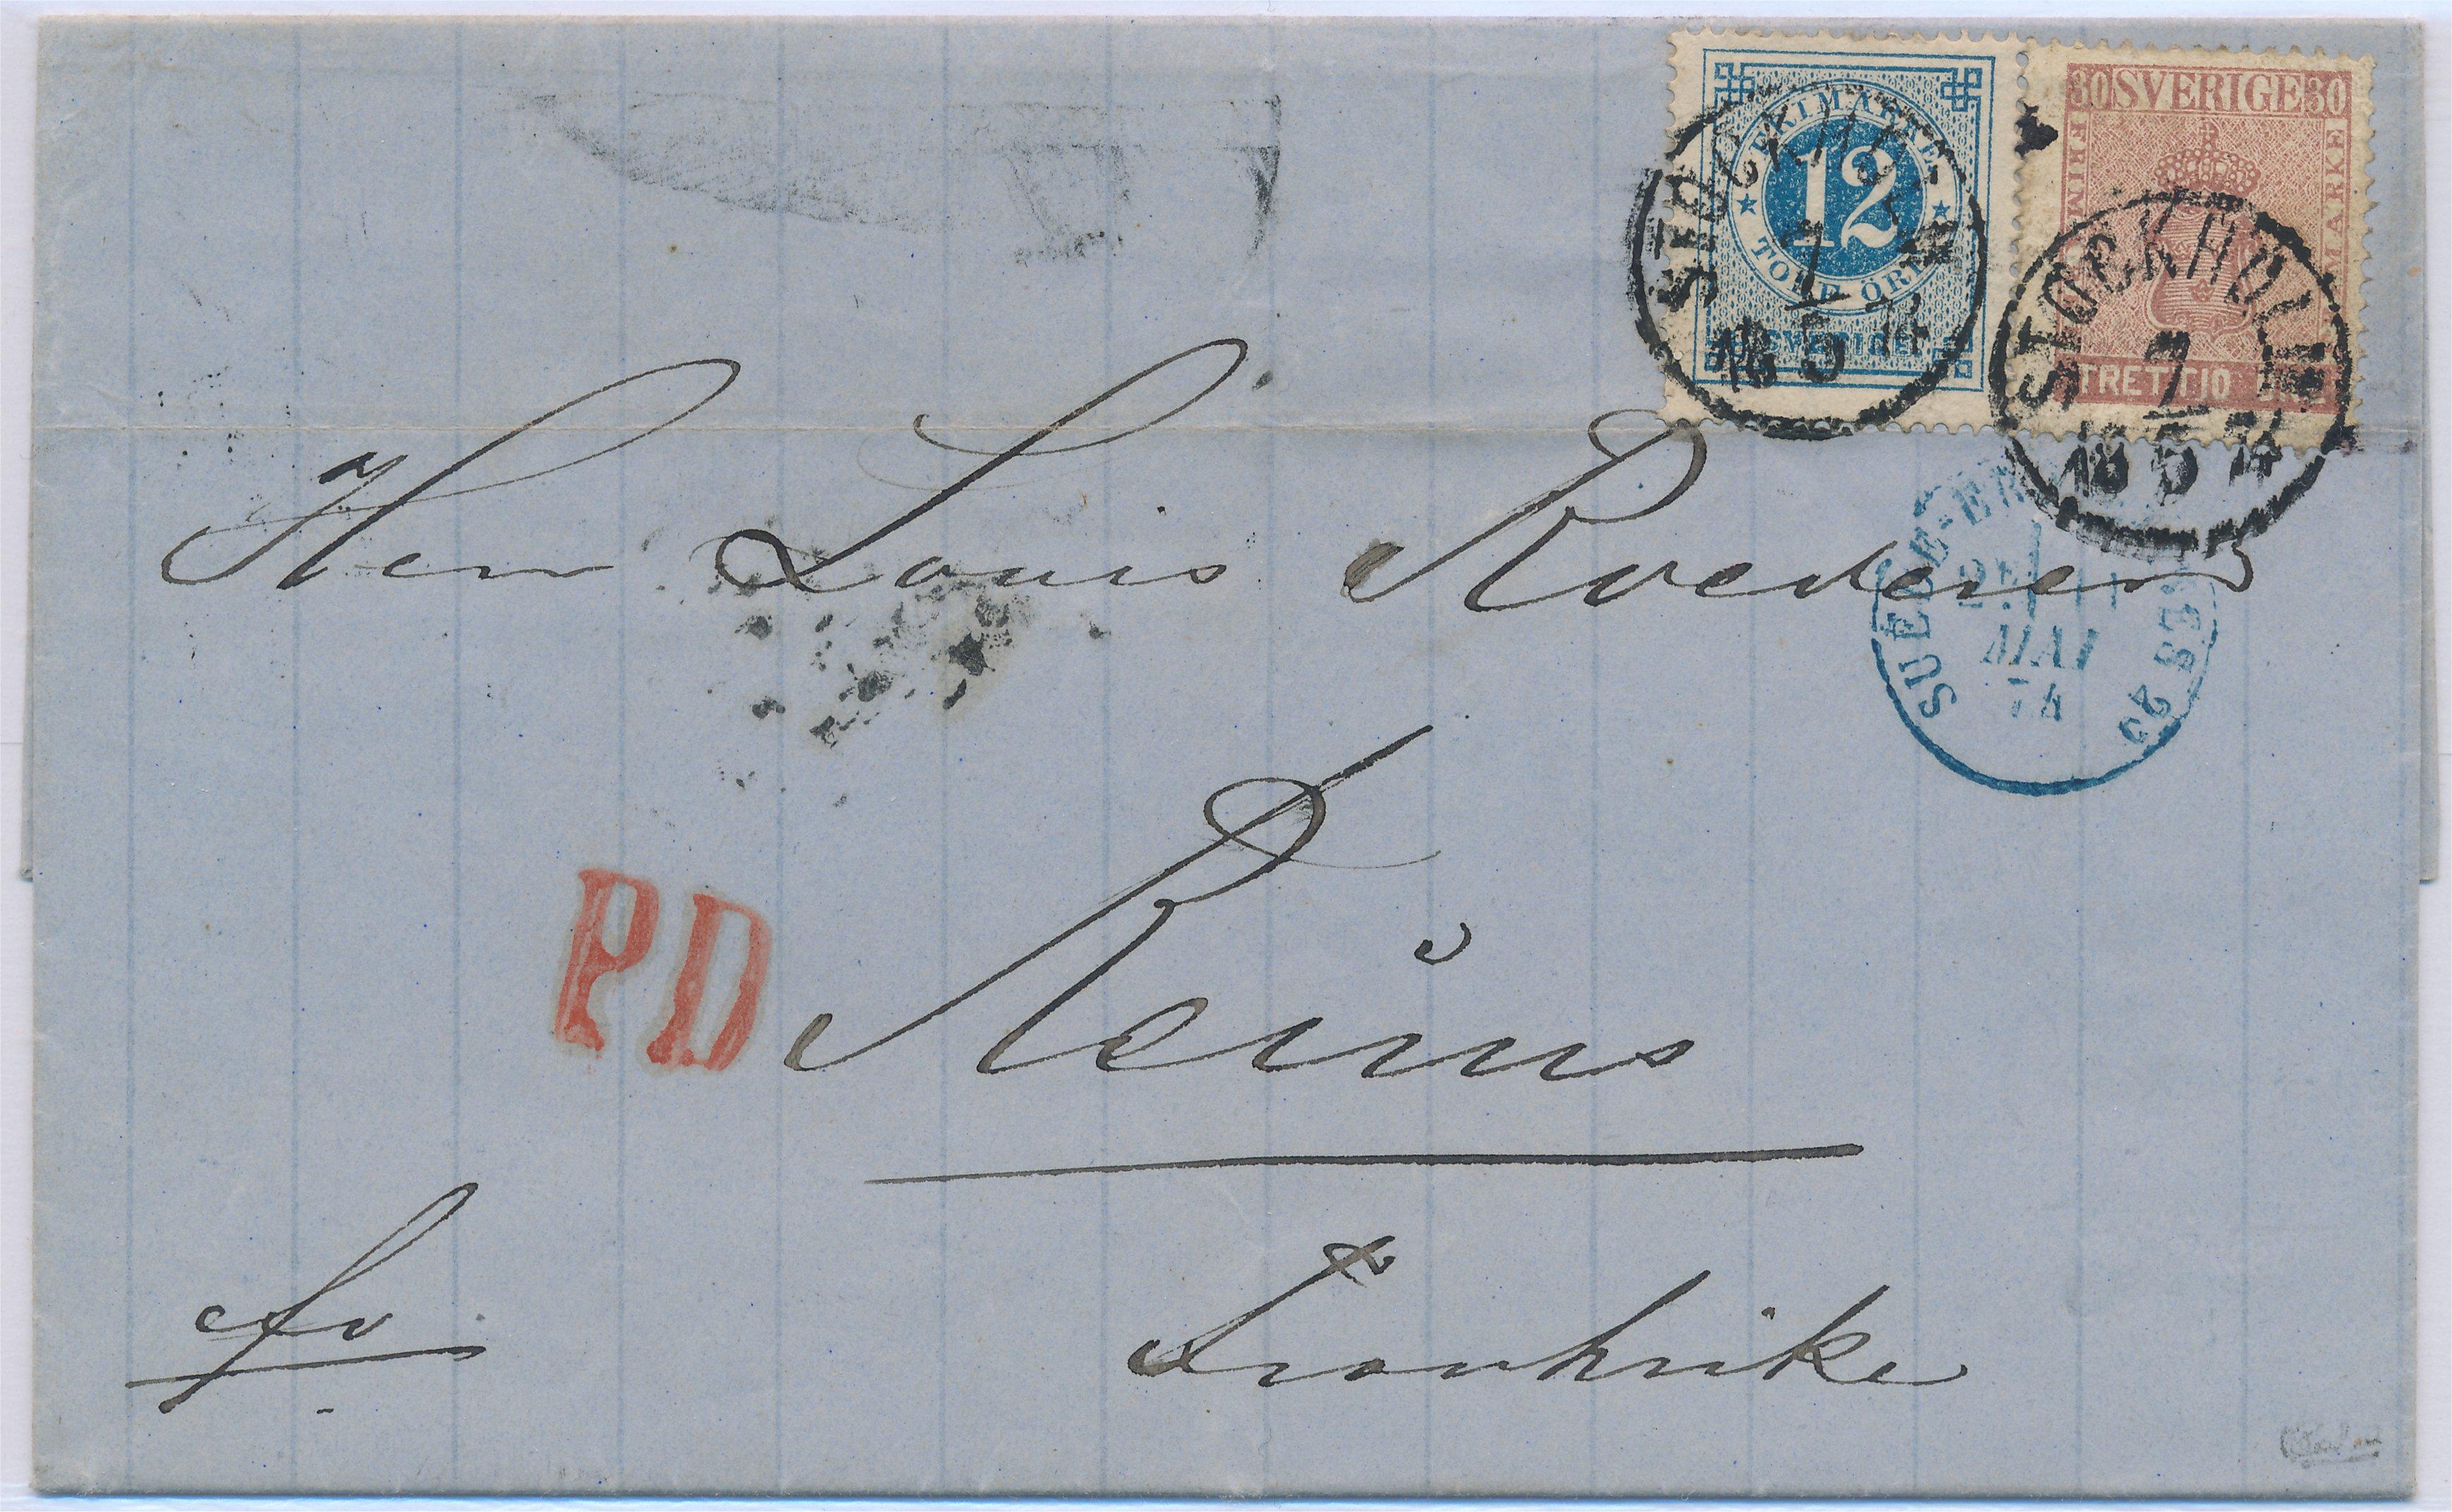 42_stockholm_7_5_1874